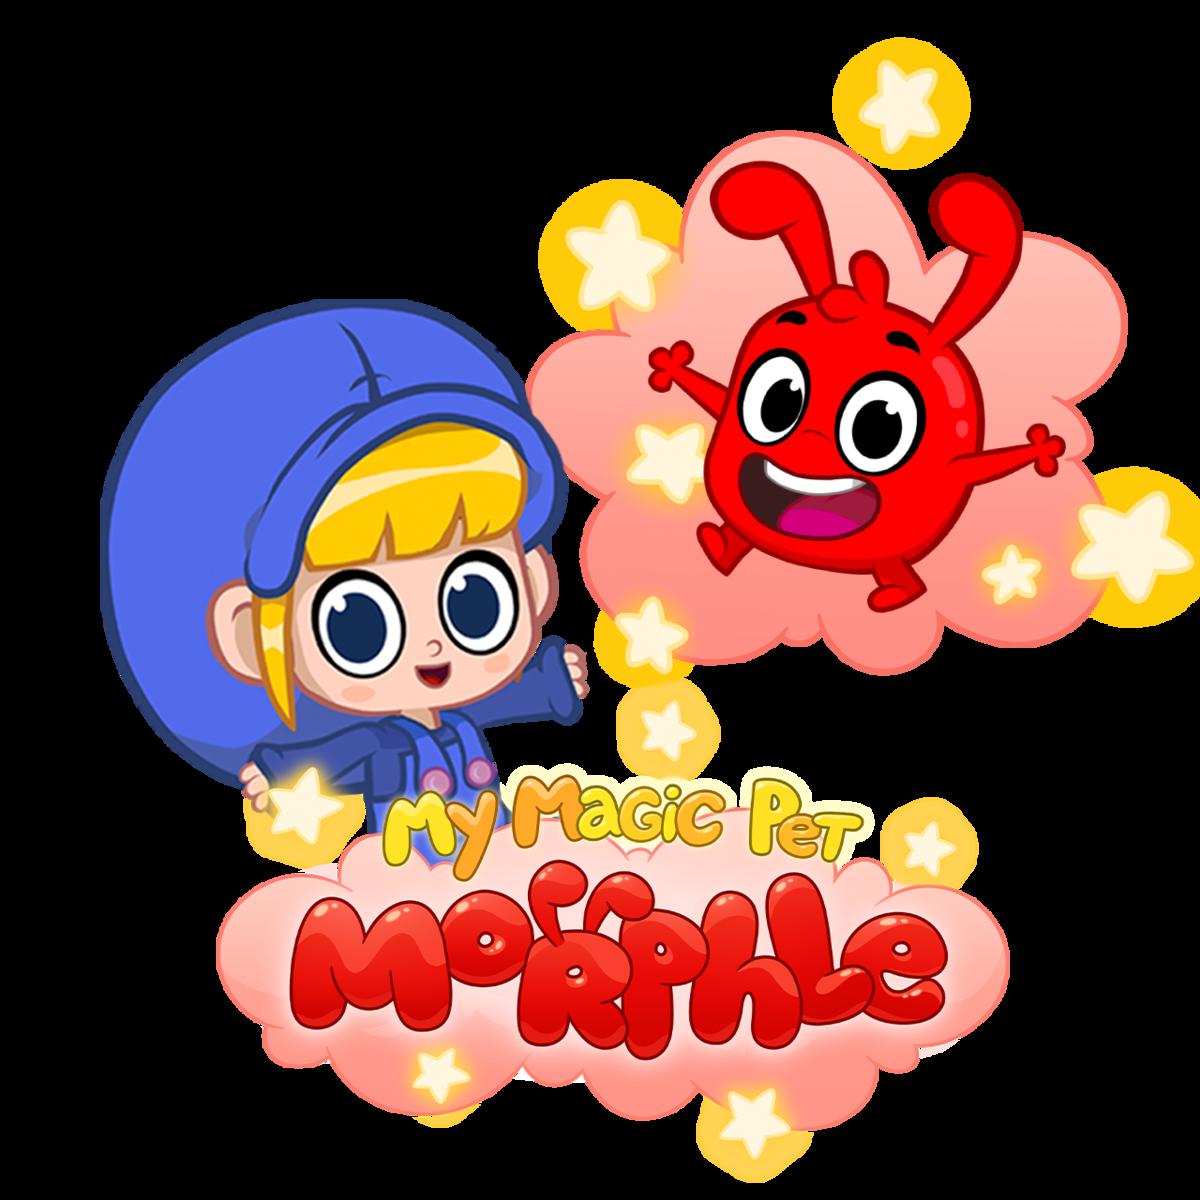 My Magic Pet Morphle